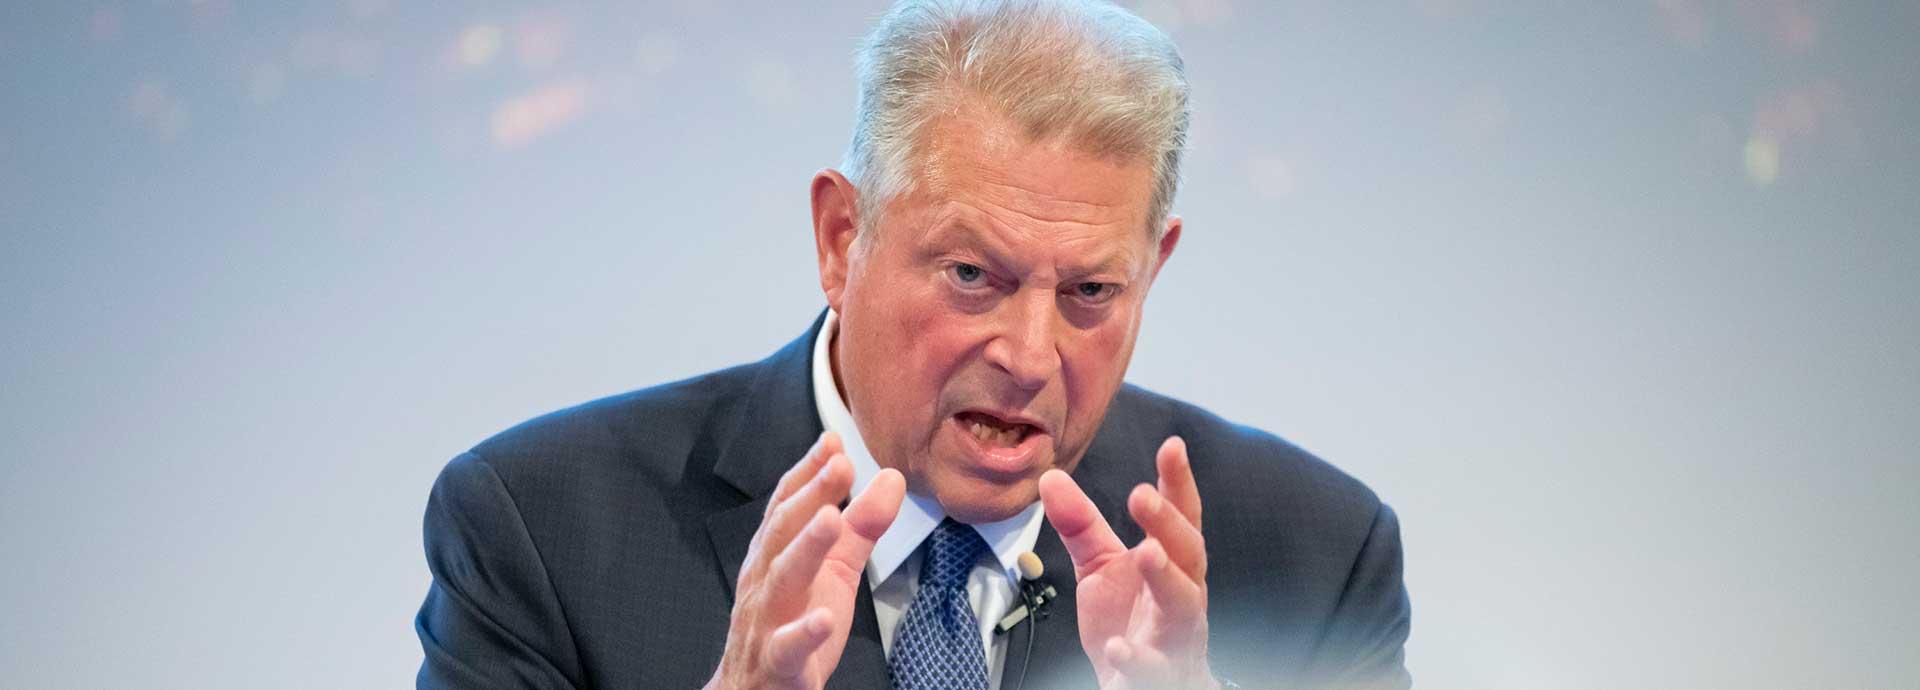 Al Gore speaks truth to power